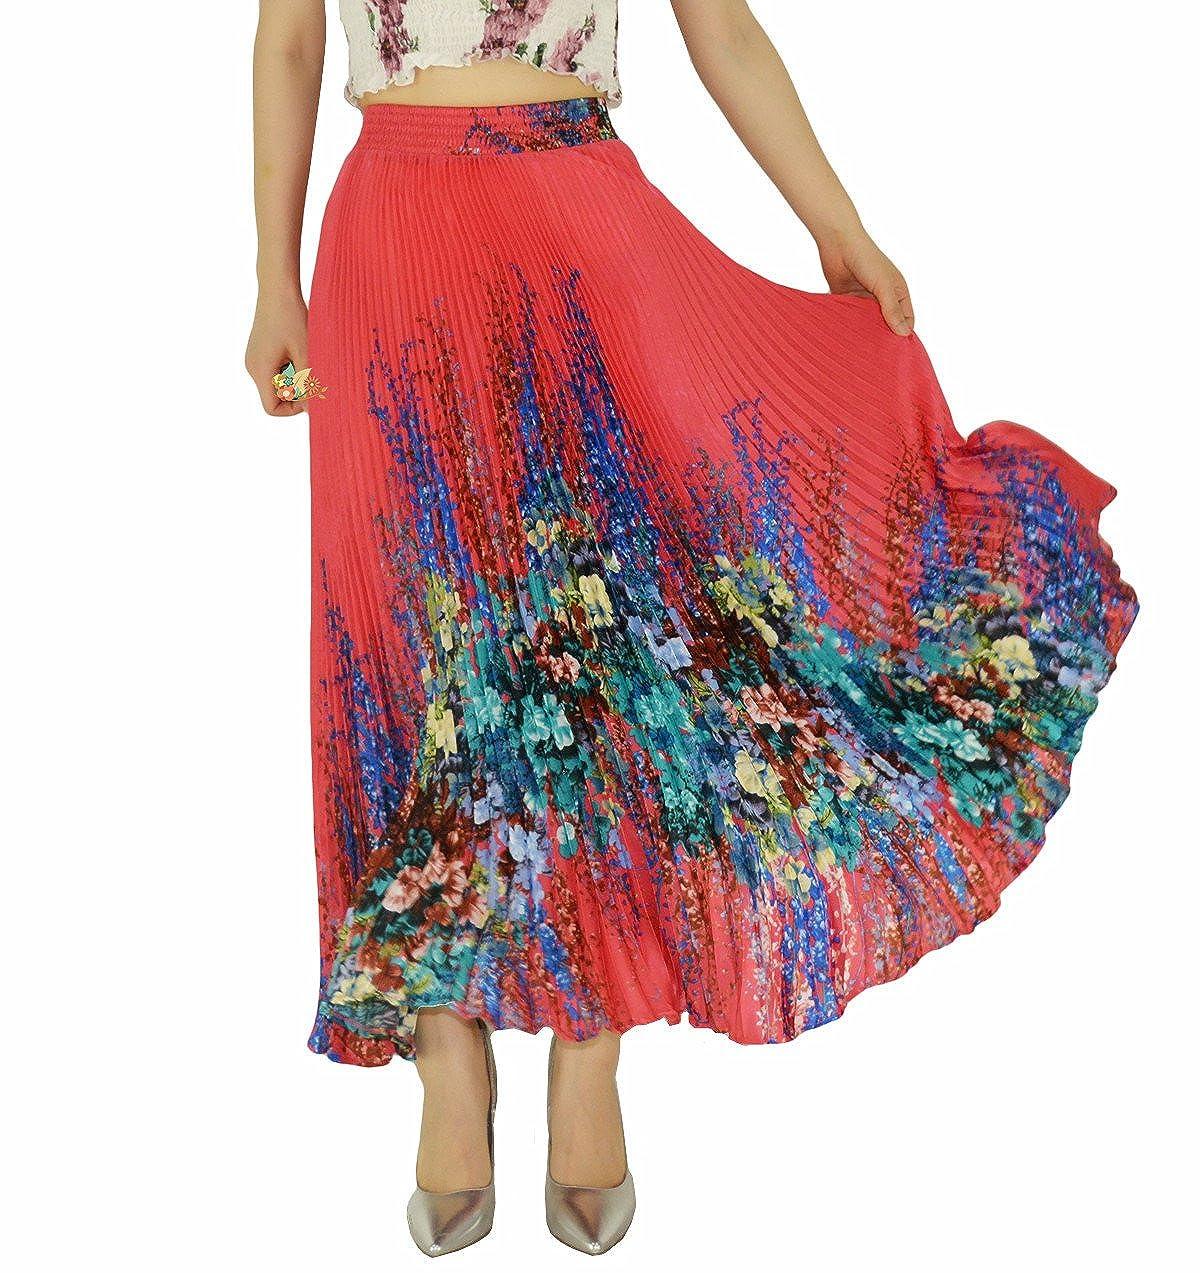 YSJ Womens Long Maxi Skirt - 35.4 Flora Sunray Pleated Chiffon Full Dress YSJ-YZQ1549